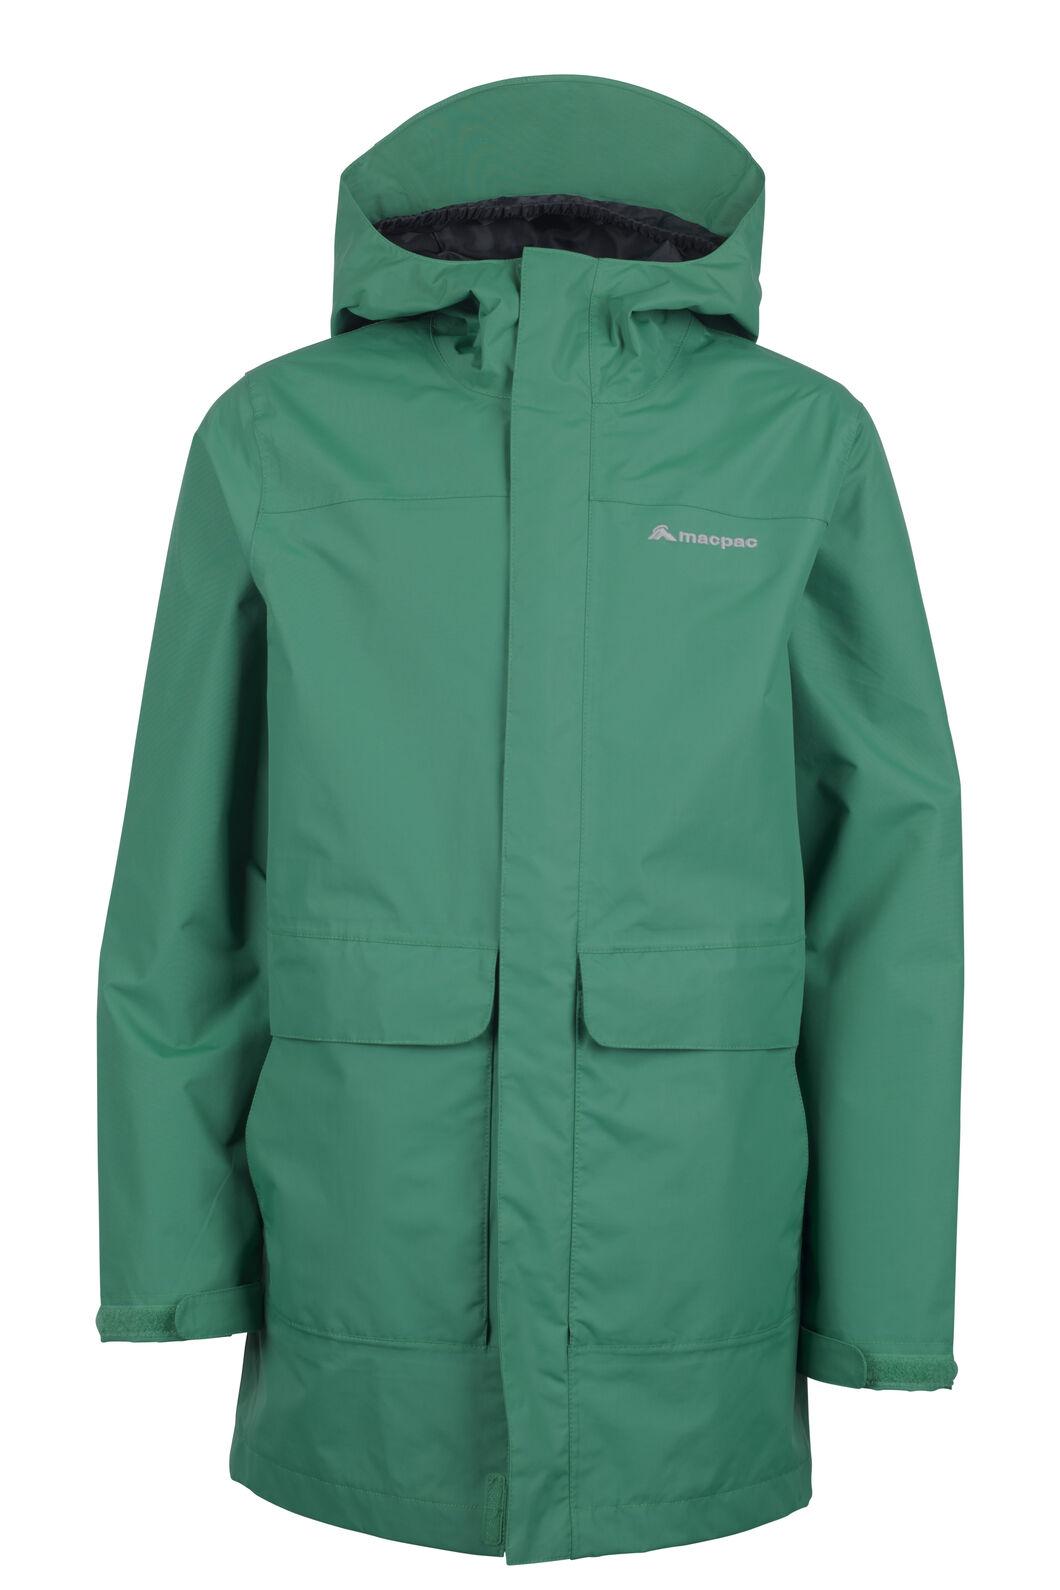 Macpac Lagoon Long Rain Jacket - Kids', Ultramarine, hi-res